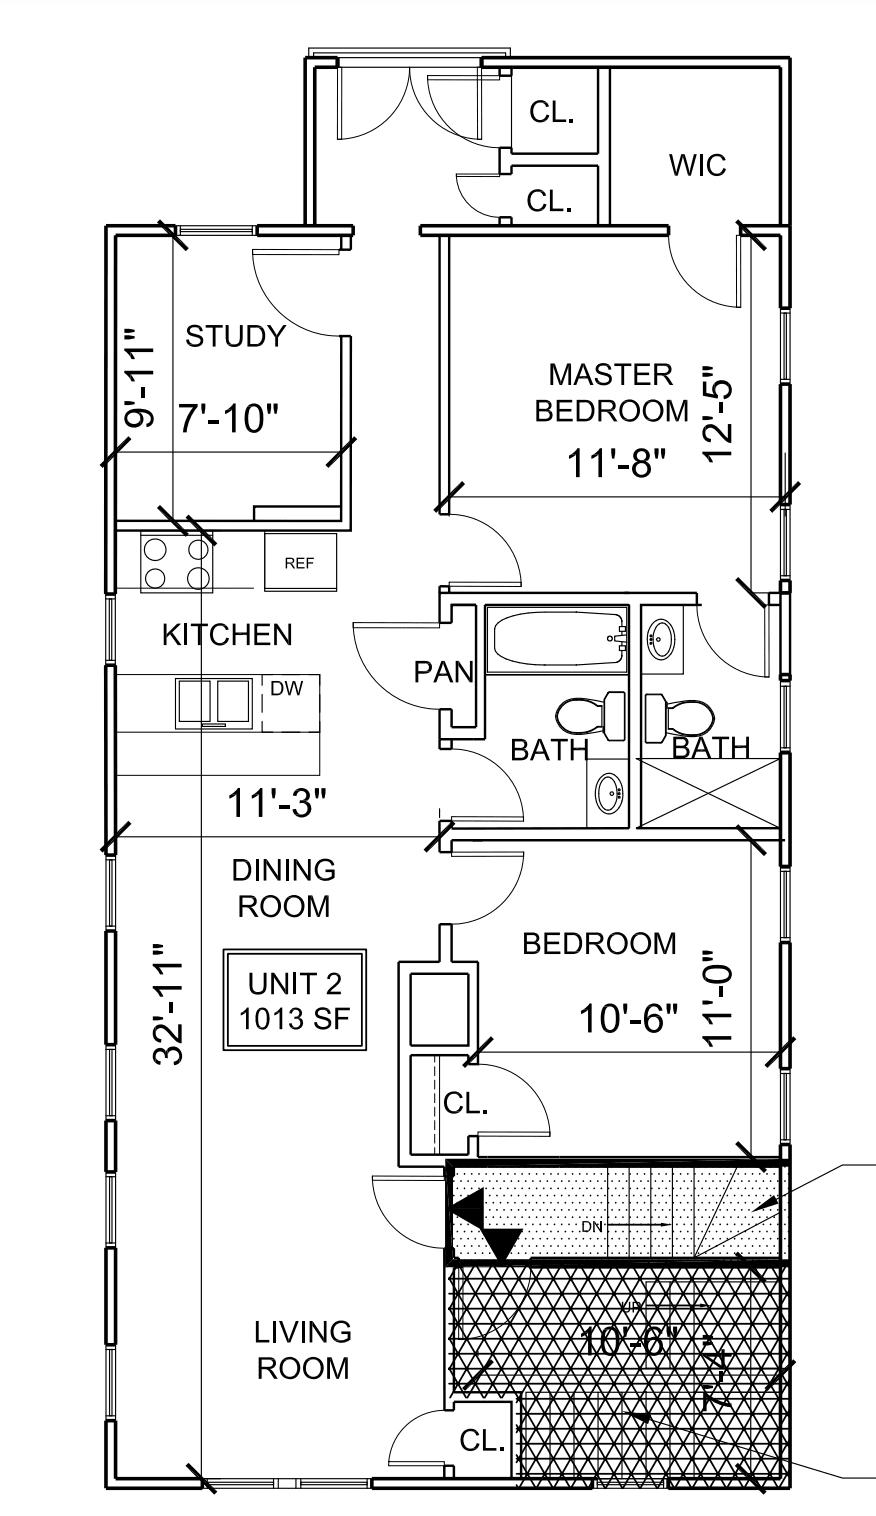 31 Clyde Street Unit 2, Somerville—2+ bedroom condo photo